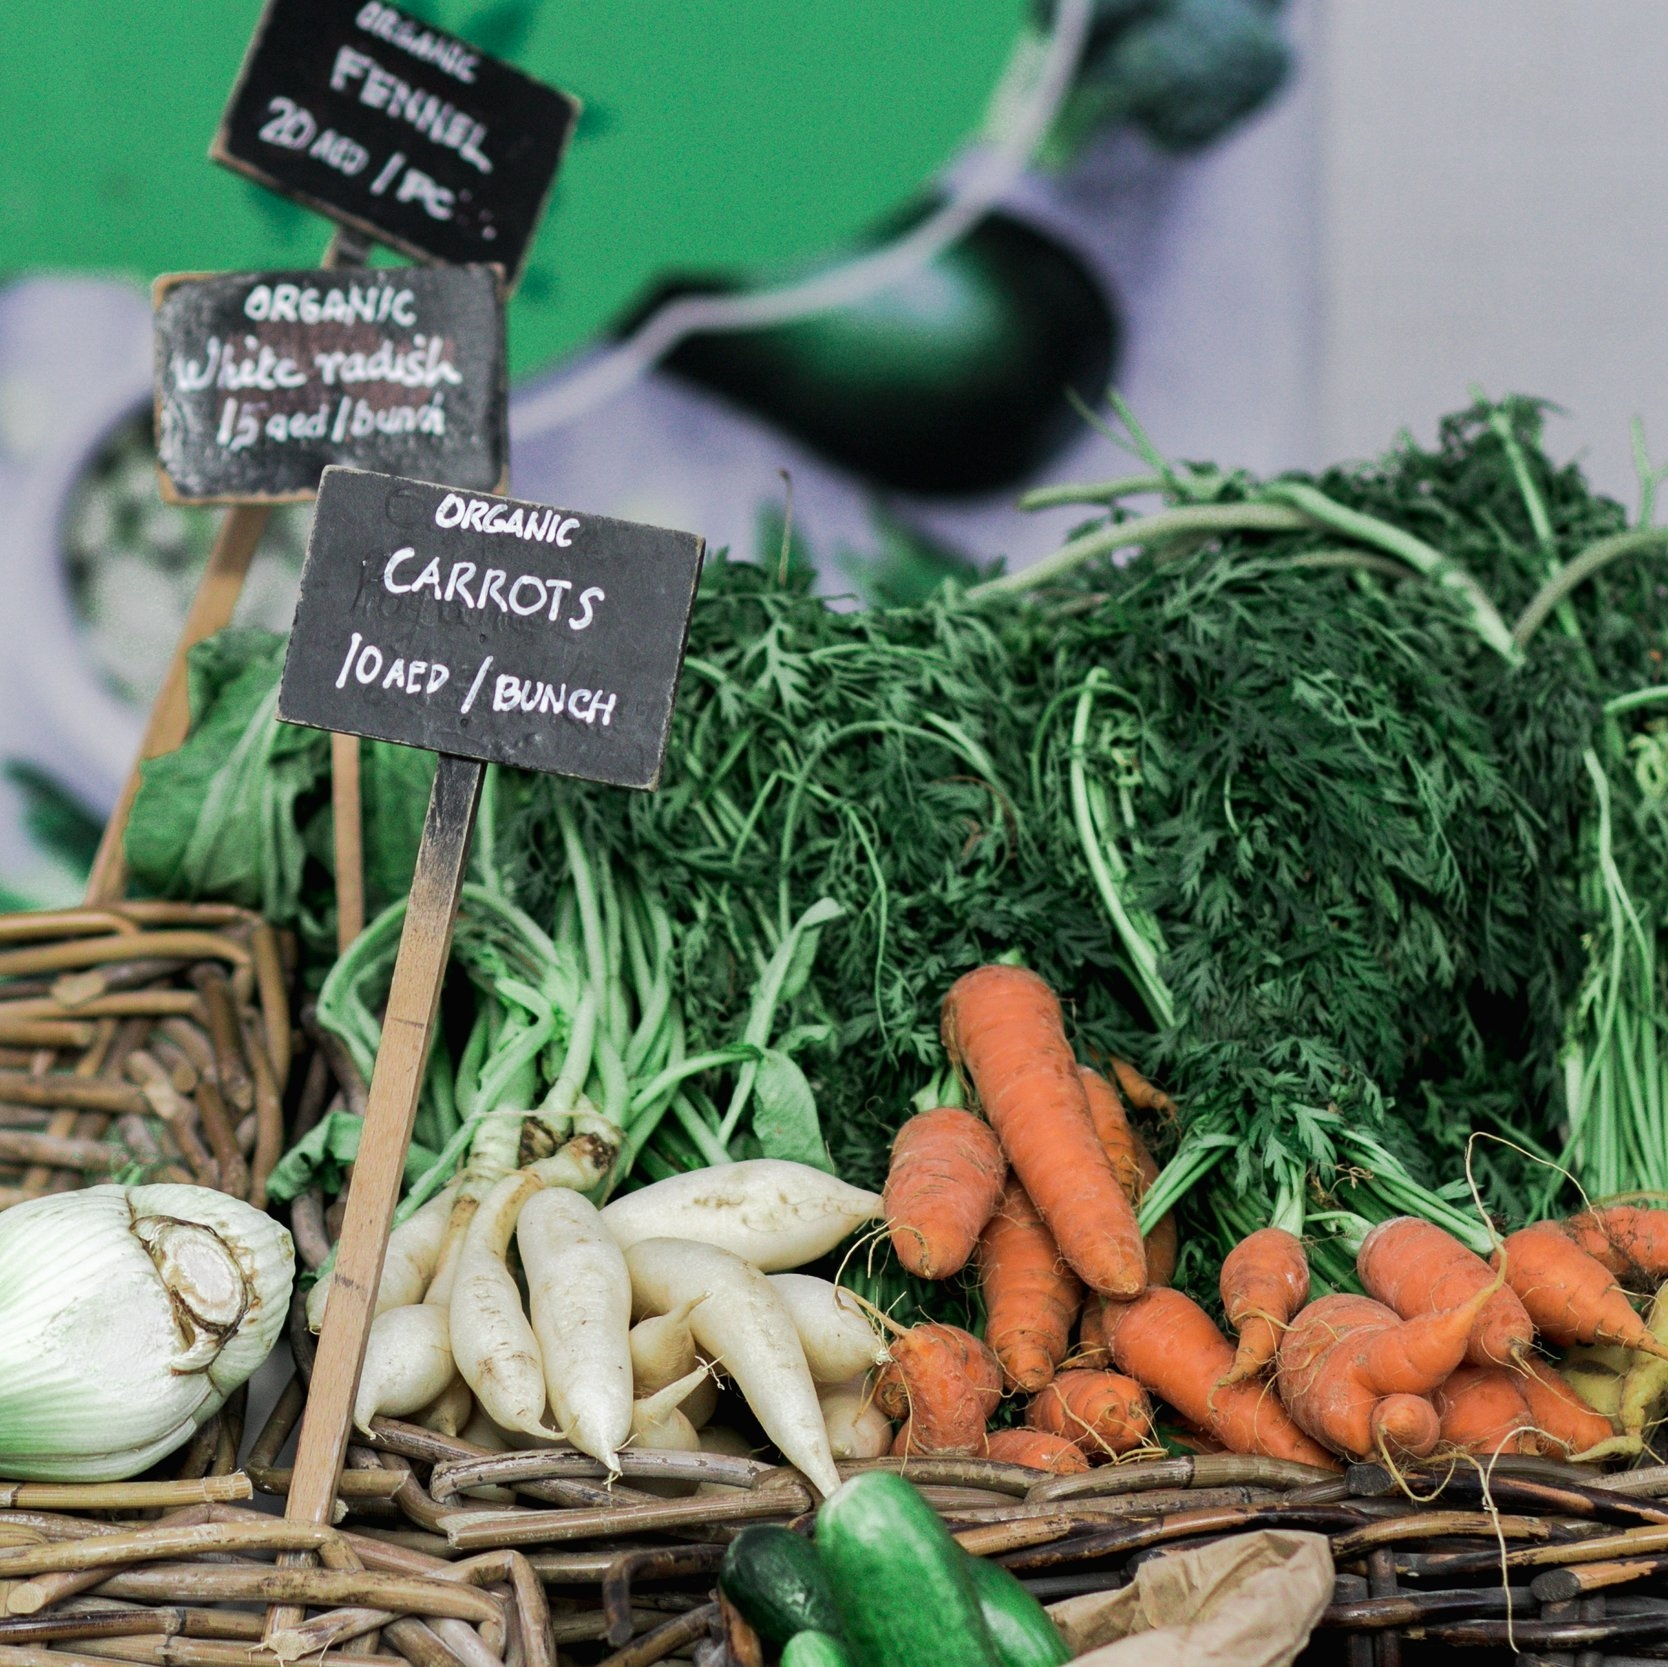 THE BENEFITS OF EATING ORGANIC - BY DR. JASON BARRITT